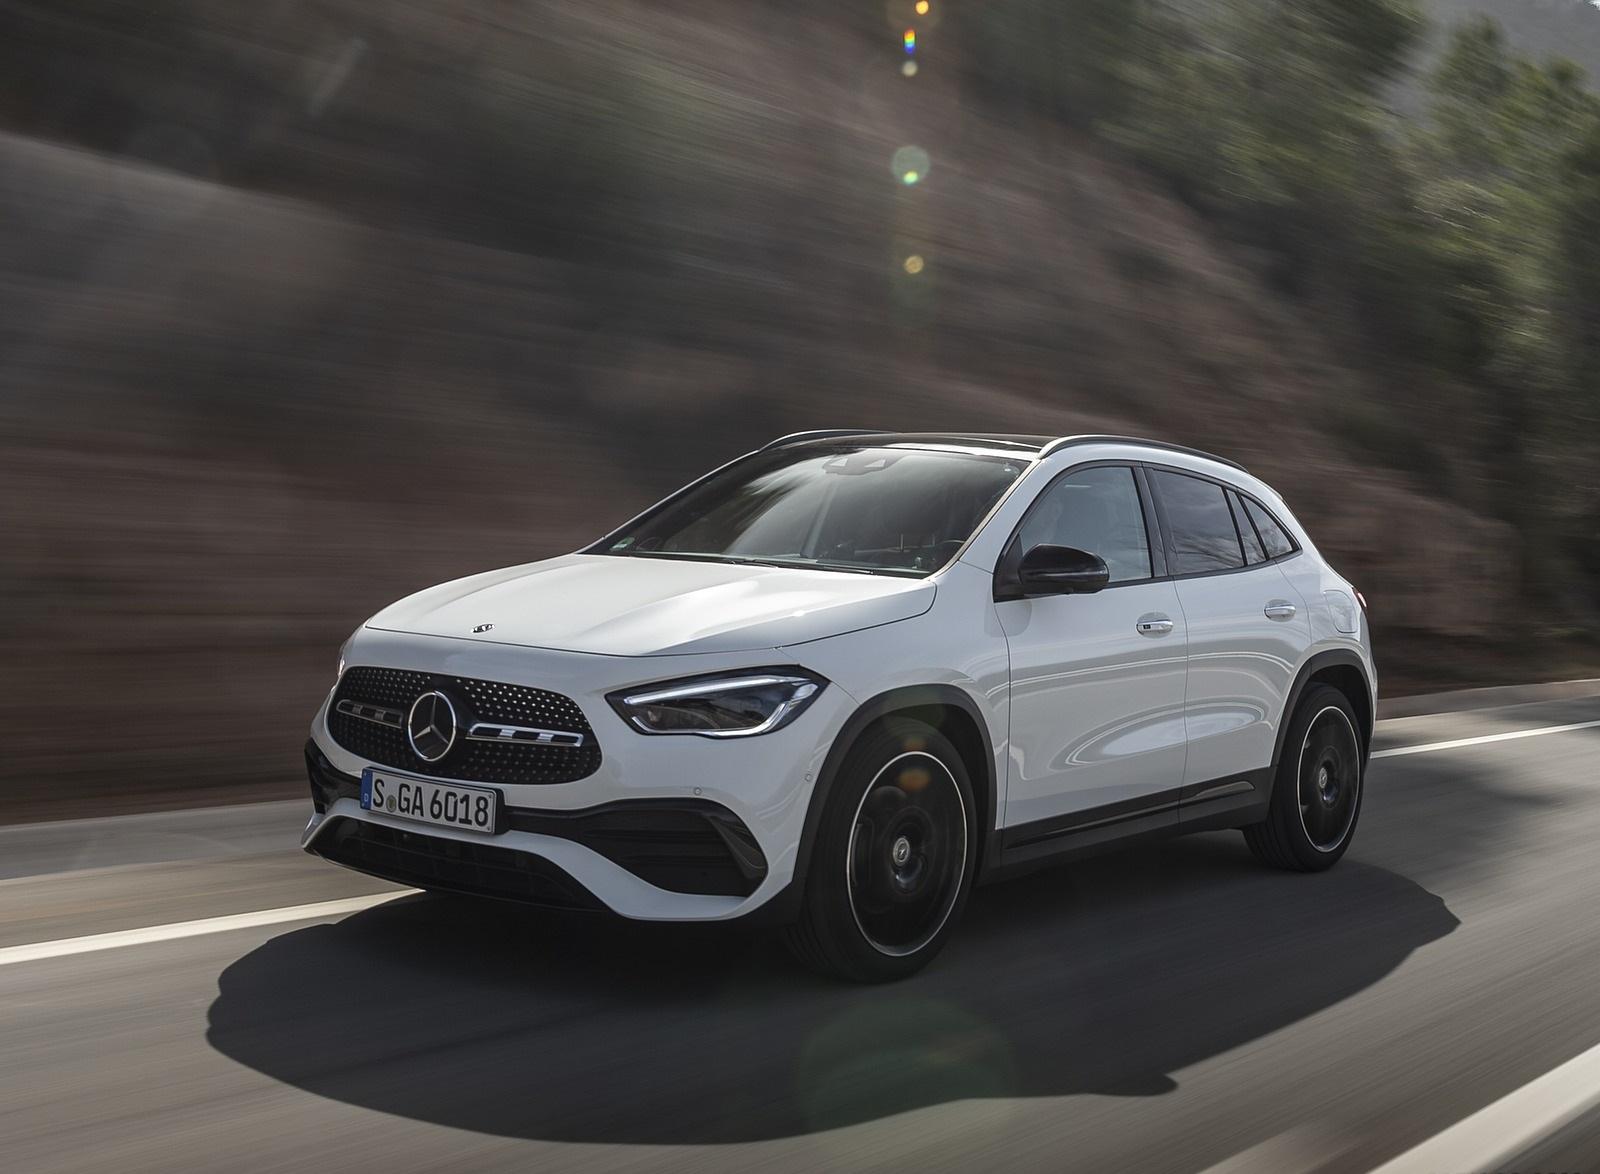 2021 Mercedes-Benz GLA 250 (Color: Digital White) Front Three-Quarter Wallpapers (3)